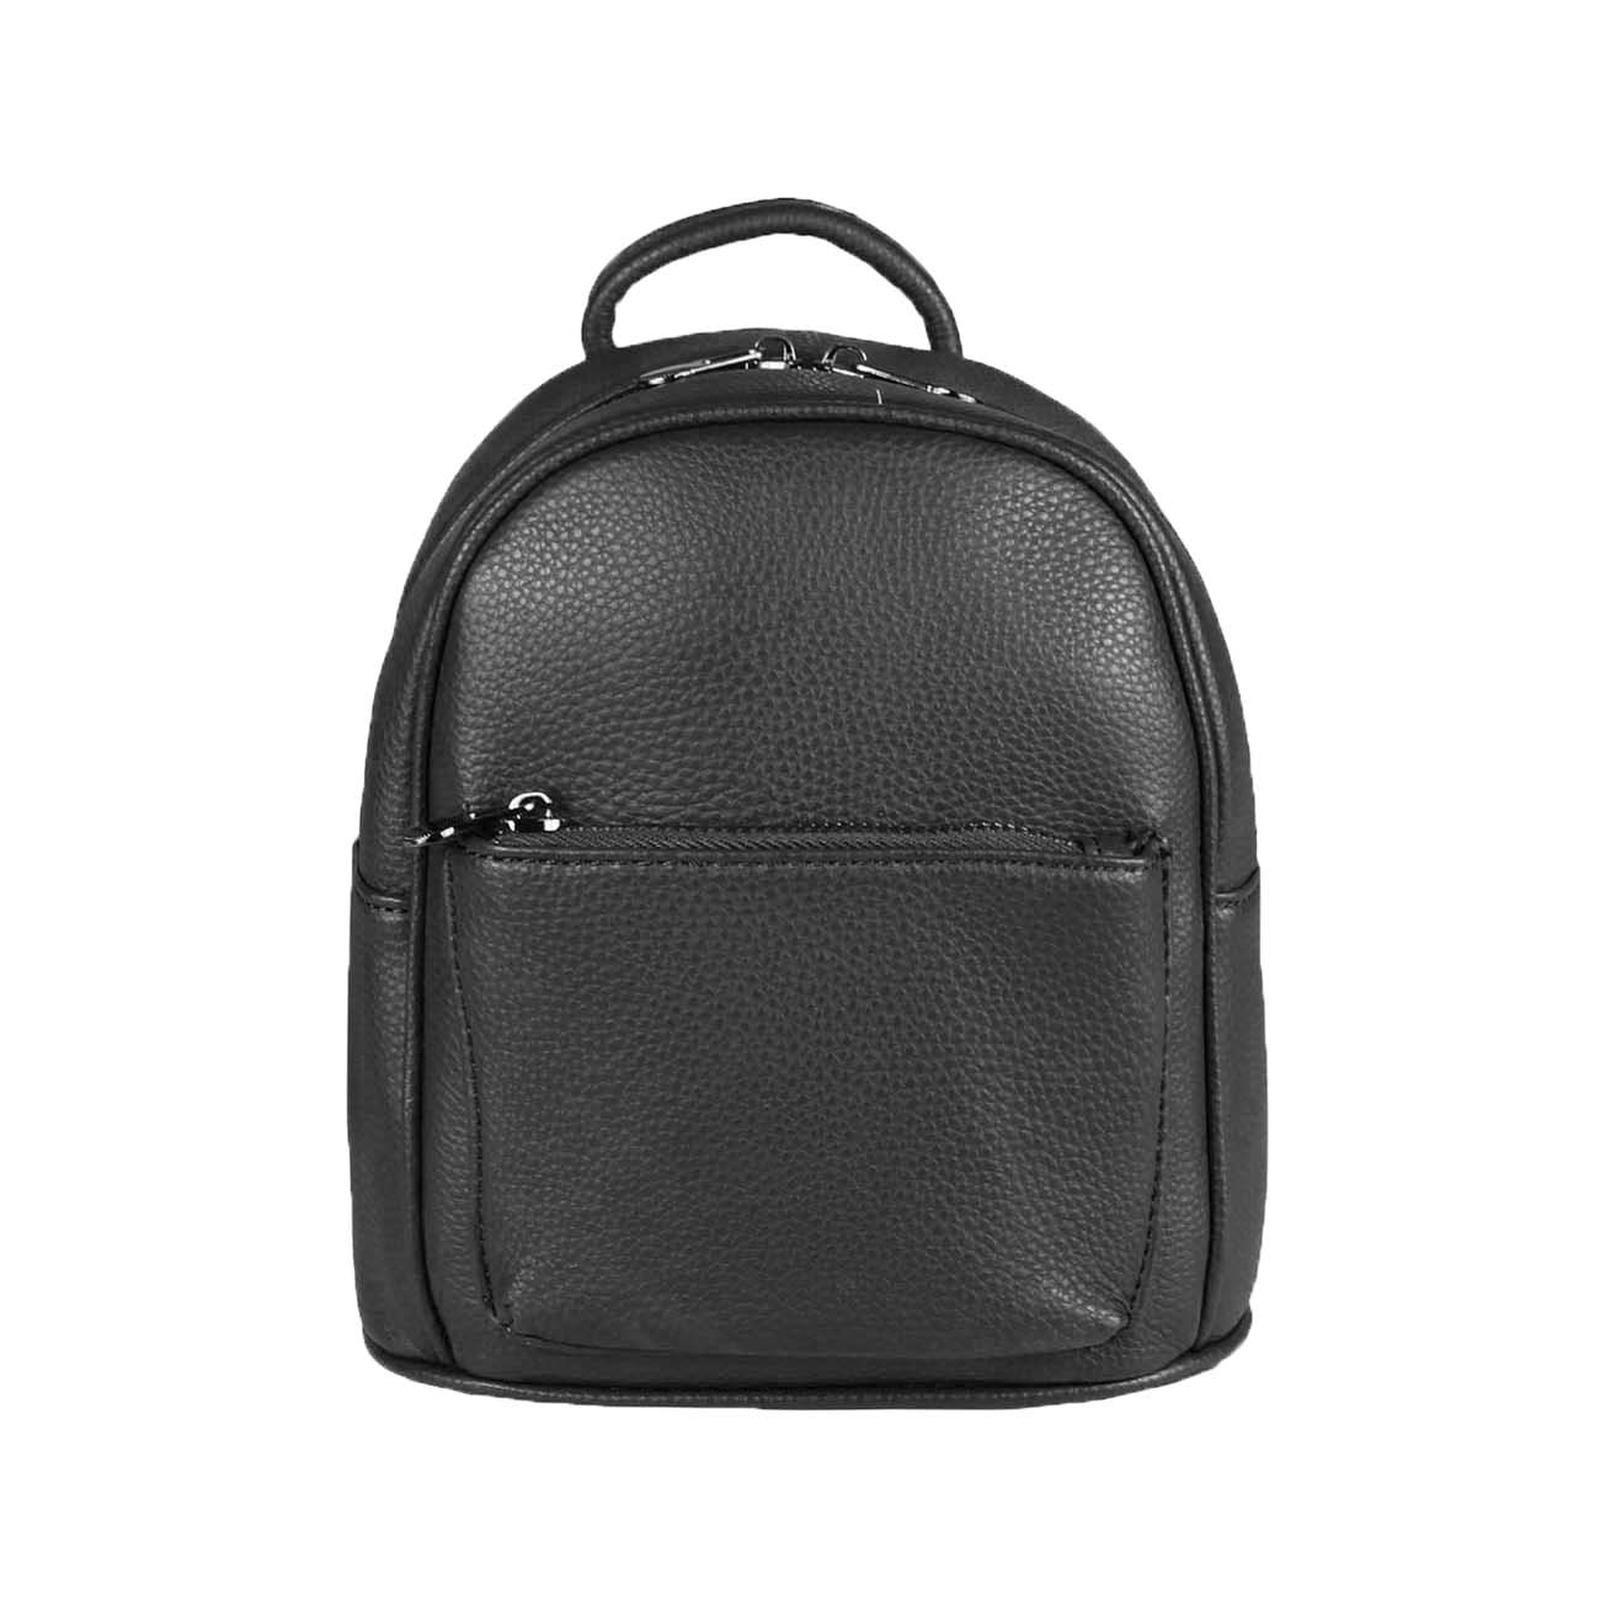 1b0dd6a4b6355 OBC ital-design DAMEN MINI-RUCKSACK Tasche Backpack Nieten Daypack  Cityrucksack Schultertasche Stadtrucksack Metallic